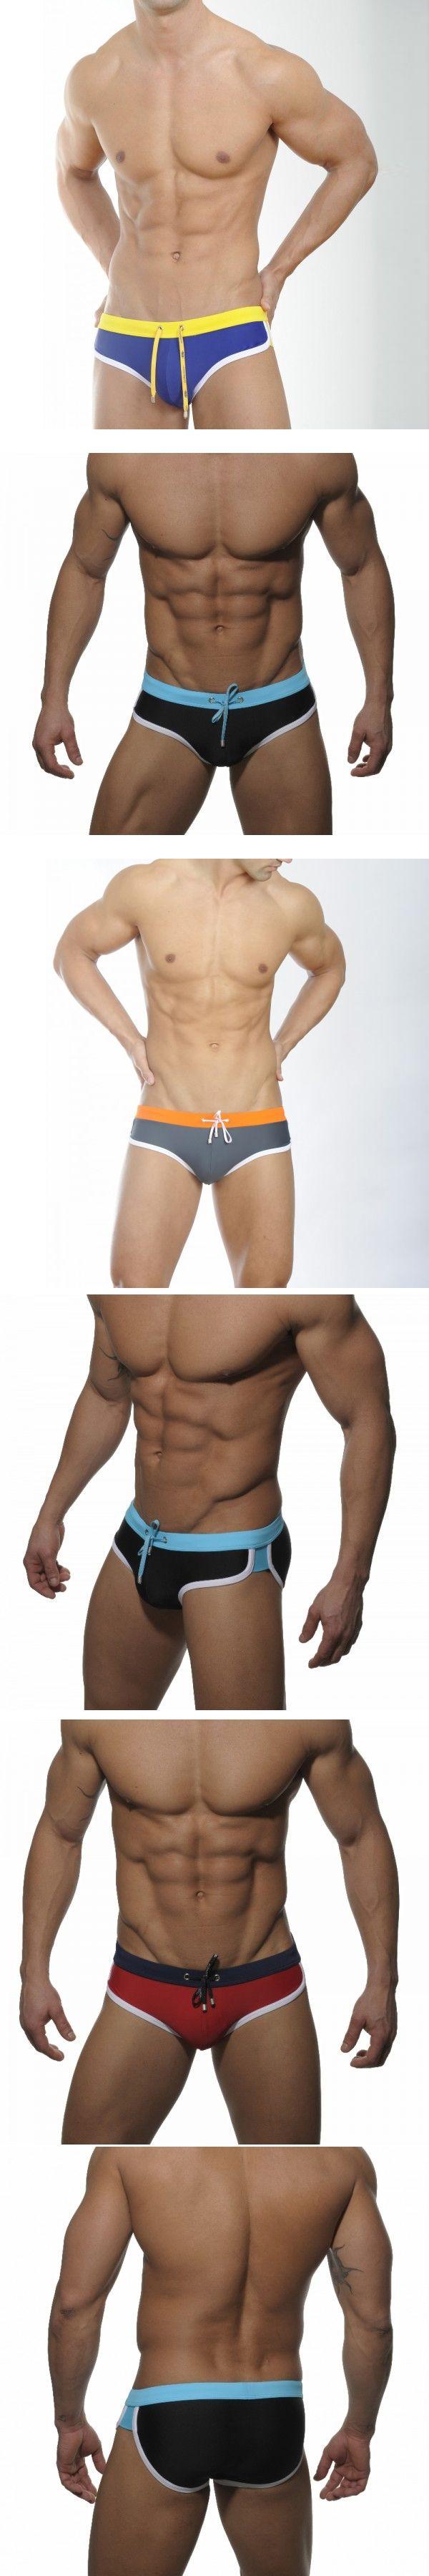 Seobean Men Swimwear Shorts Spandex Elastic Force Swim Brief Sexy Summer Beach Swimsuit Male Swimming Trunks Underwear Pants Hot